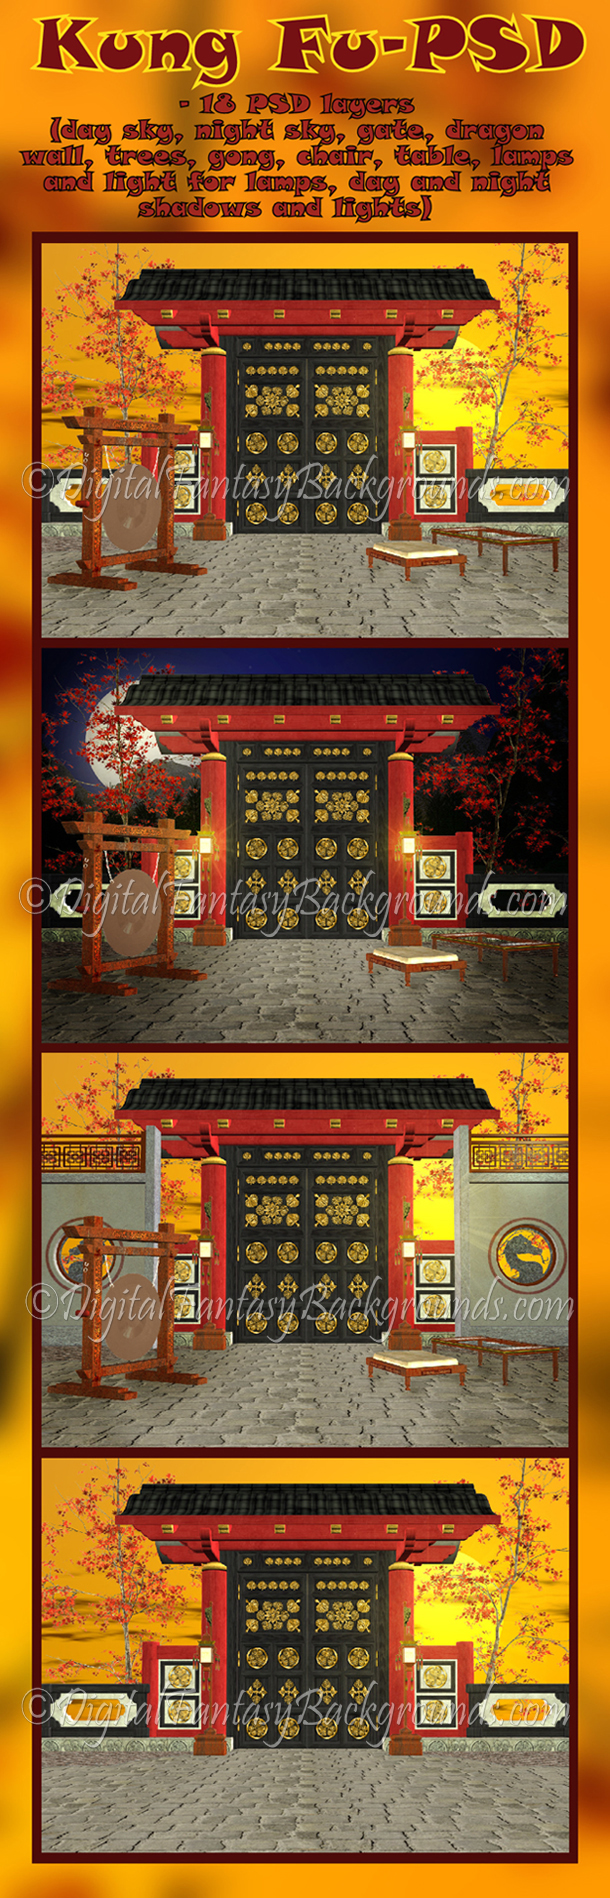 kung_fu_PSD-cover.jpg